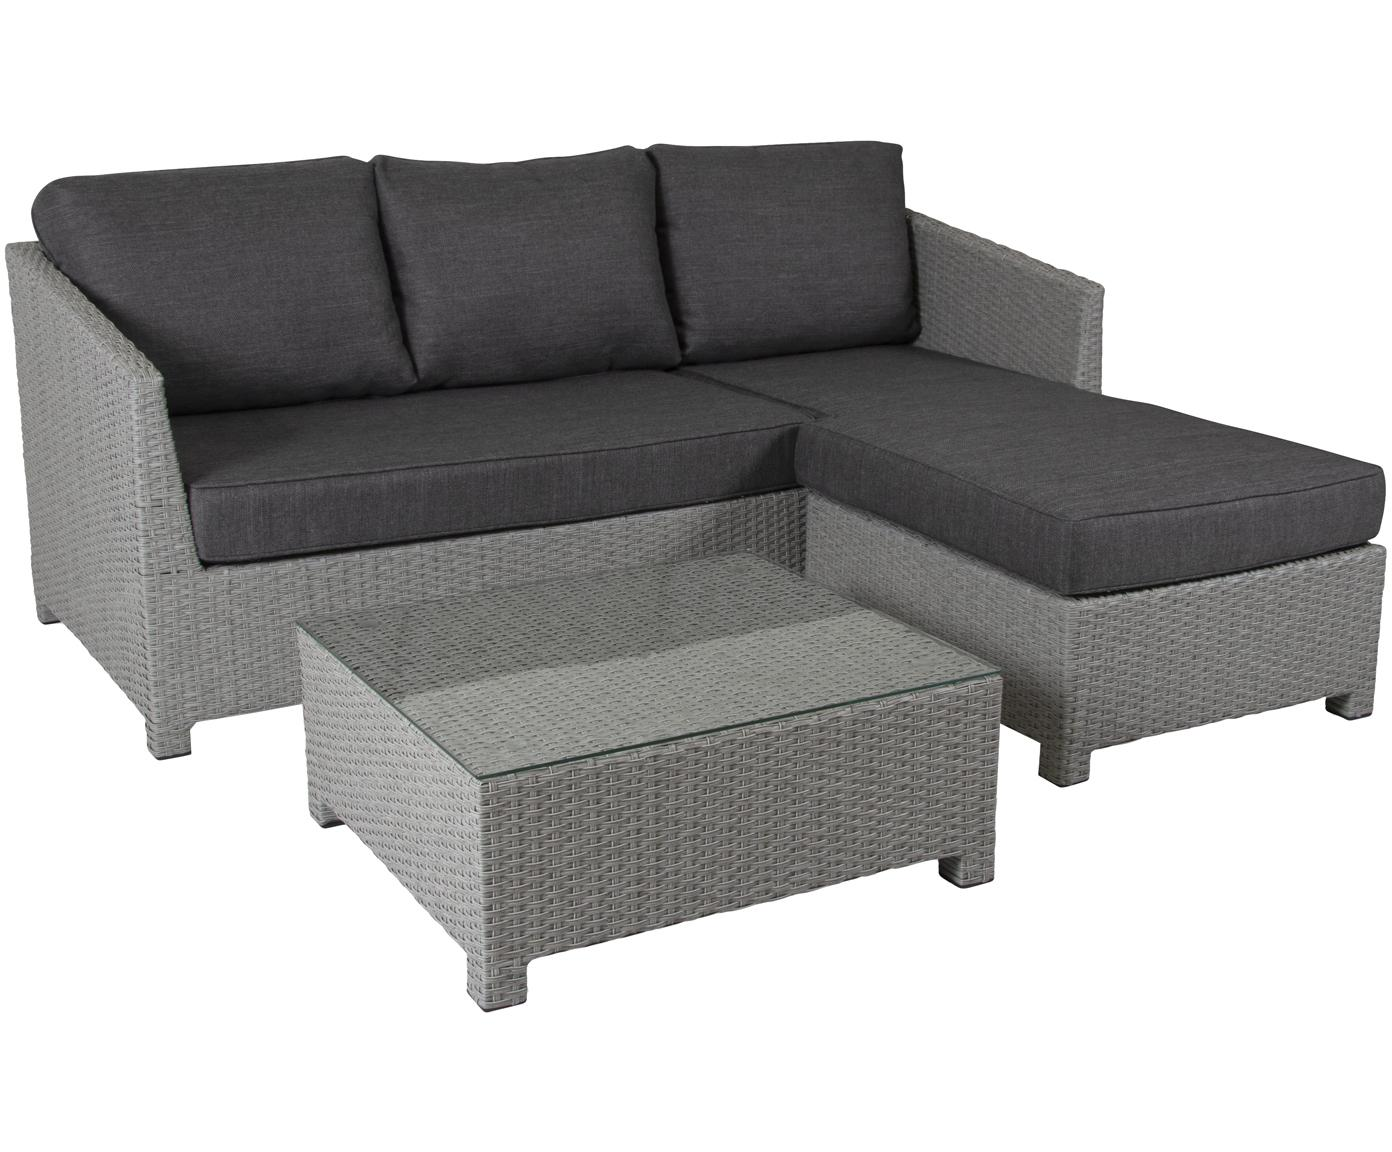 Set lounge de exterior Conmay, 3pzas., Estructura: aluminio, ratán sintético, Tapizado: olefina, Tablero: vidrio, Gris, gris oscuro, transparente, Tamaños diferentes